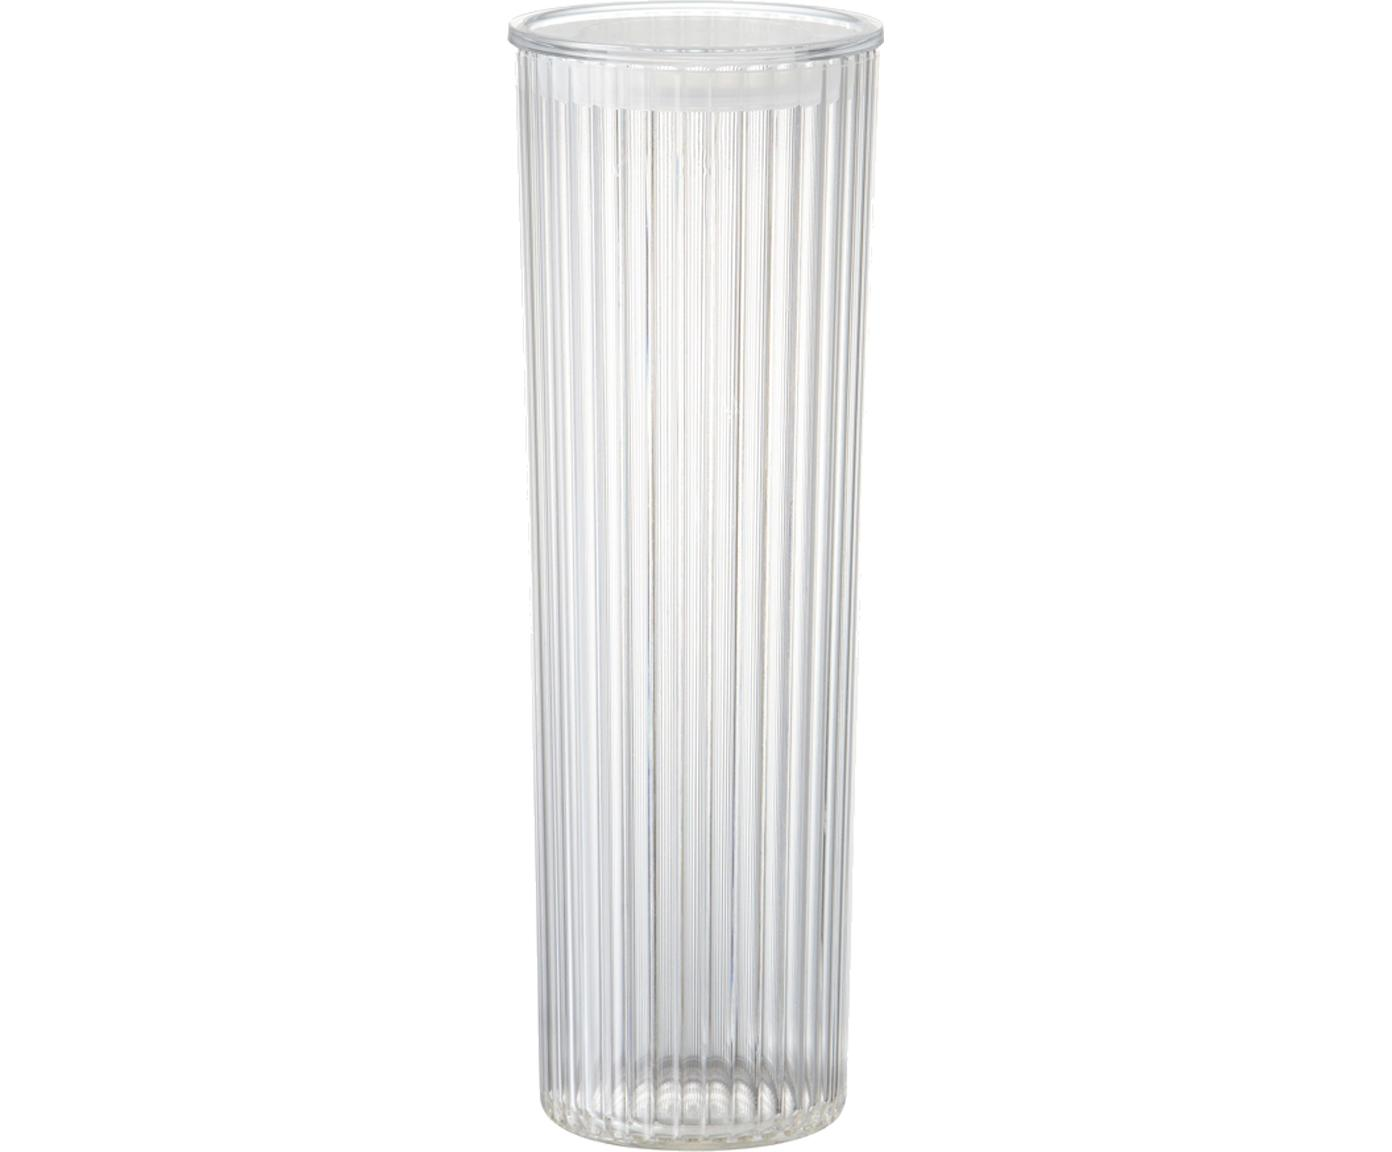 Bote de plástico Fonte, Plástico (PMS), Transparente, Ø 11 x Al 31cm